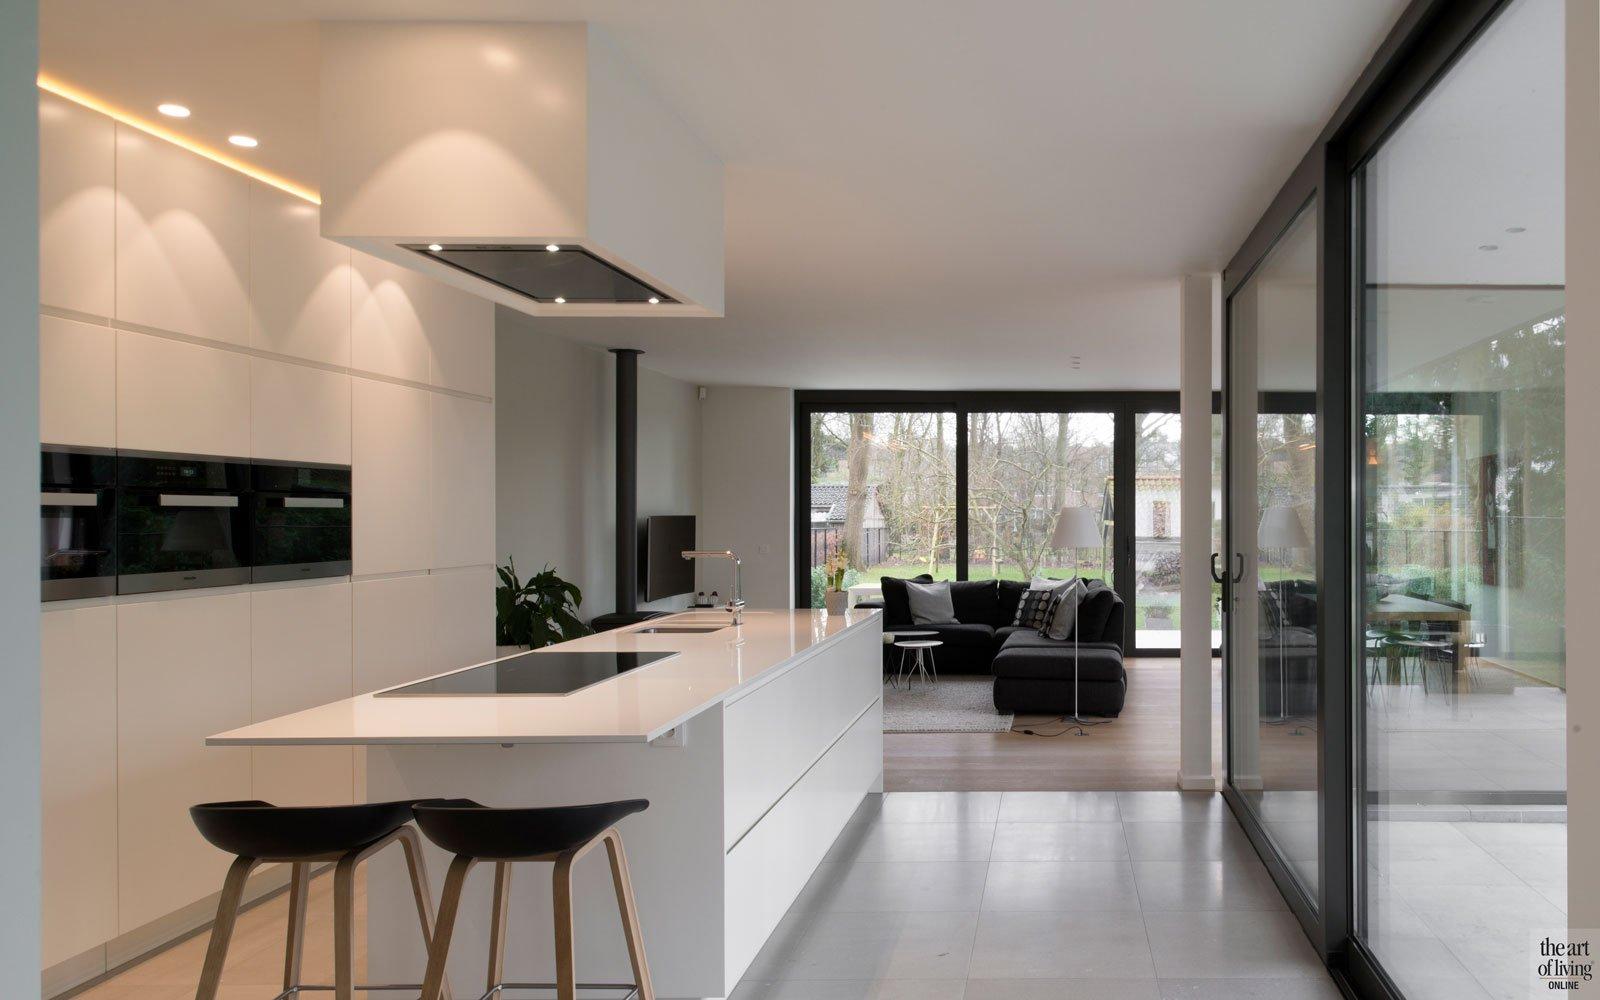 Open keuken, kookeiland, krukjes, wit, strak, grote ramen, modern villa, Leers & Partners